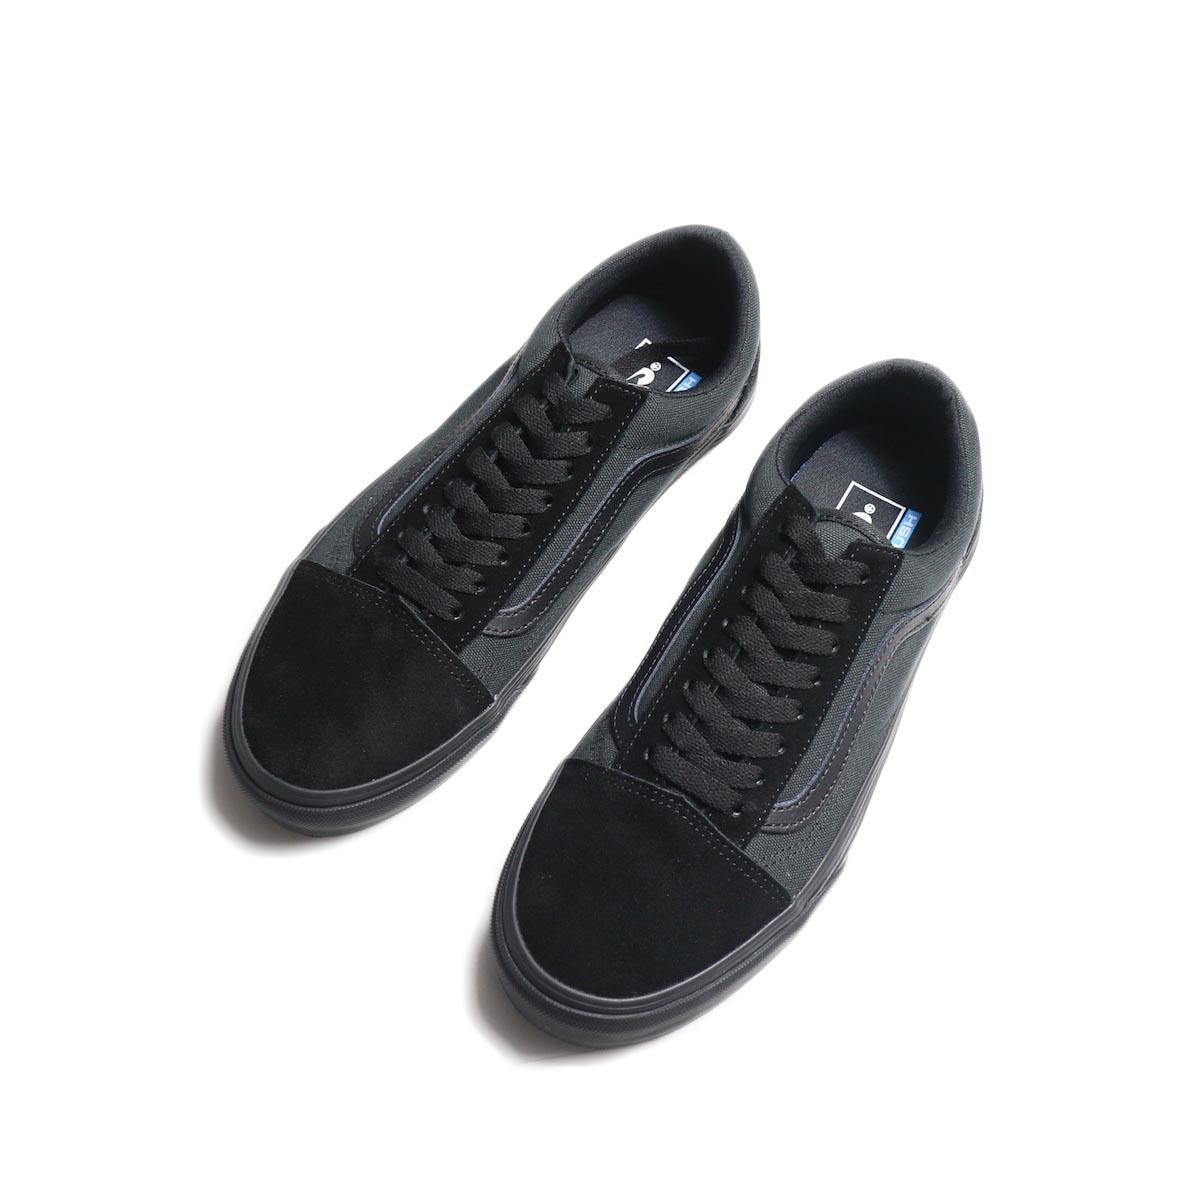 VANS / OLD SKOOL UC (Made For The Makers) -Black